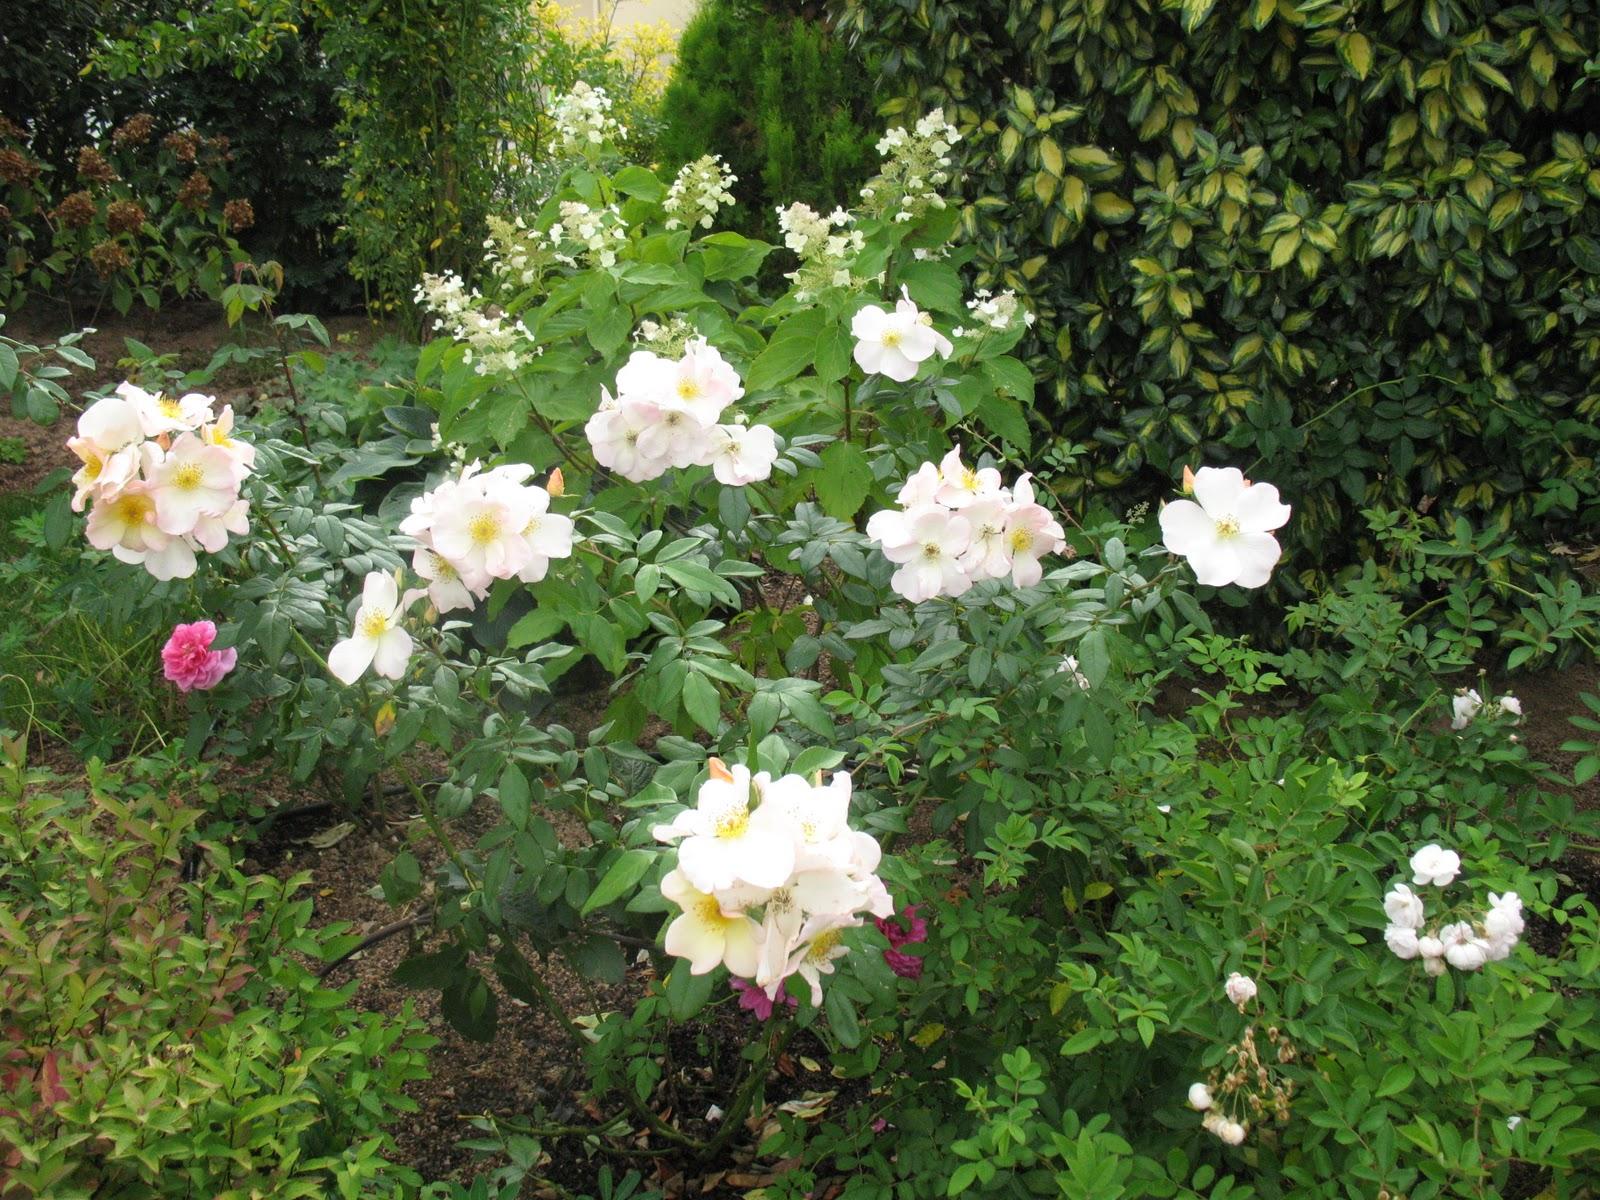 Roses du jardin ch neland rosier sally holmes - Maladie du rosier ...